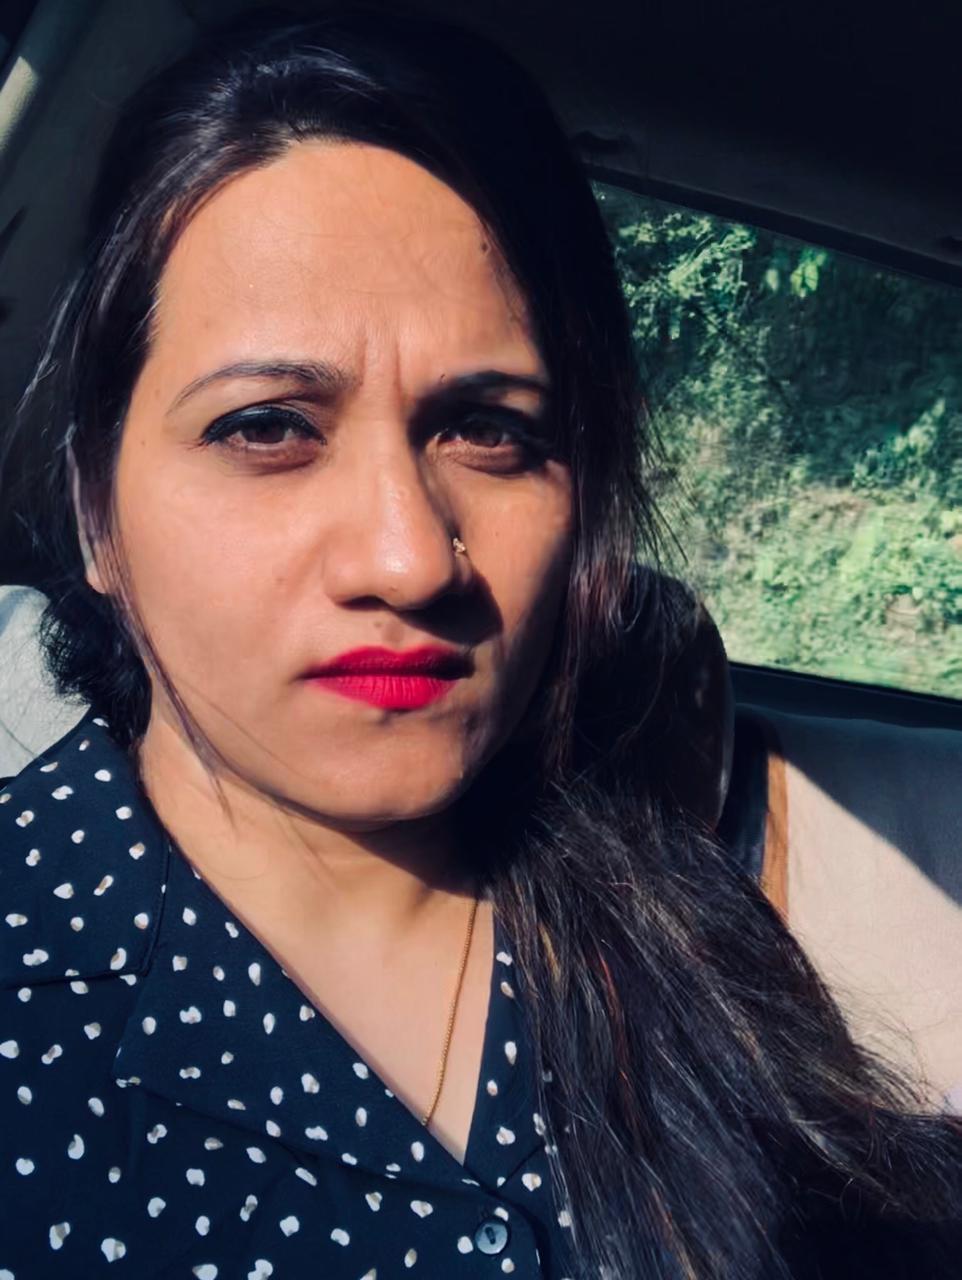 Tripti, Household Goods Shifting From Gurgaon To Rudraprayag